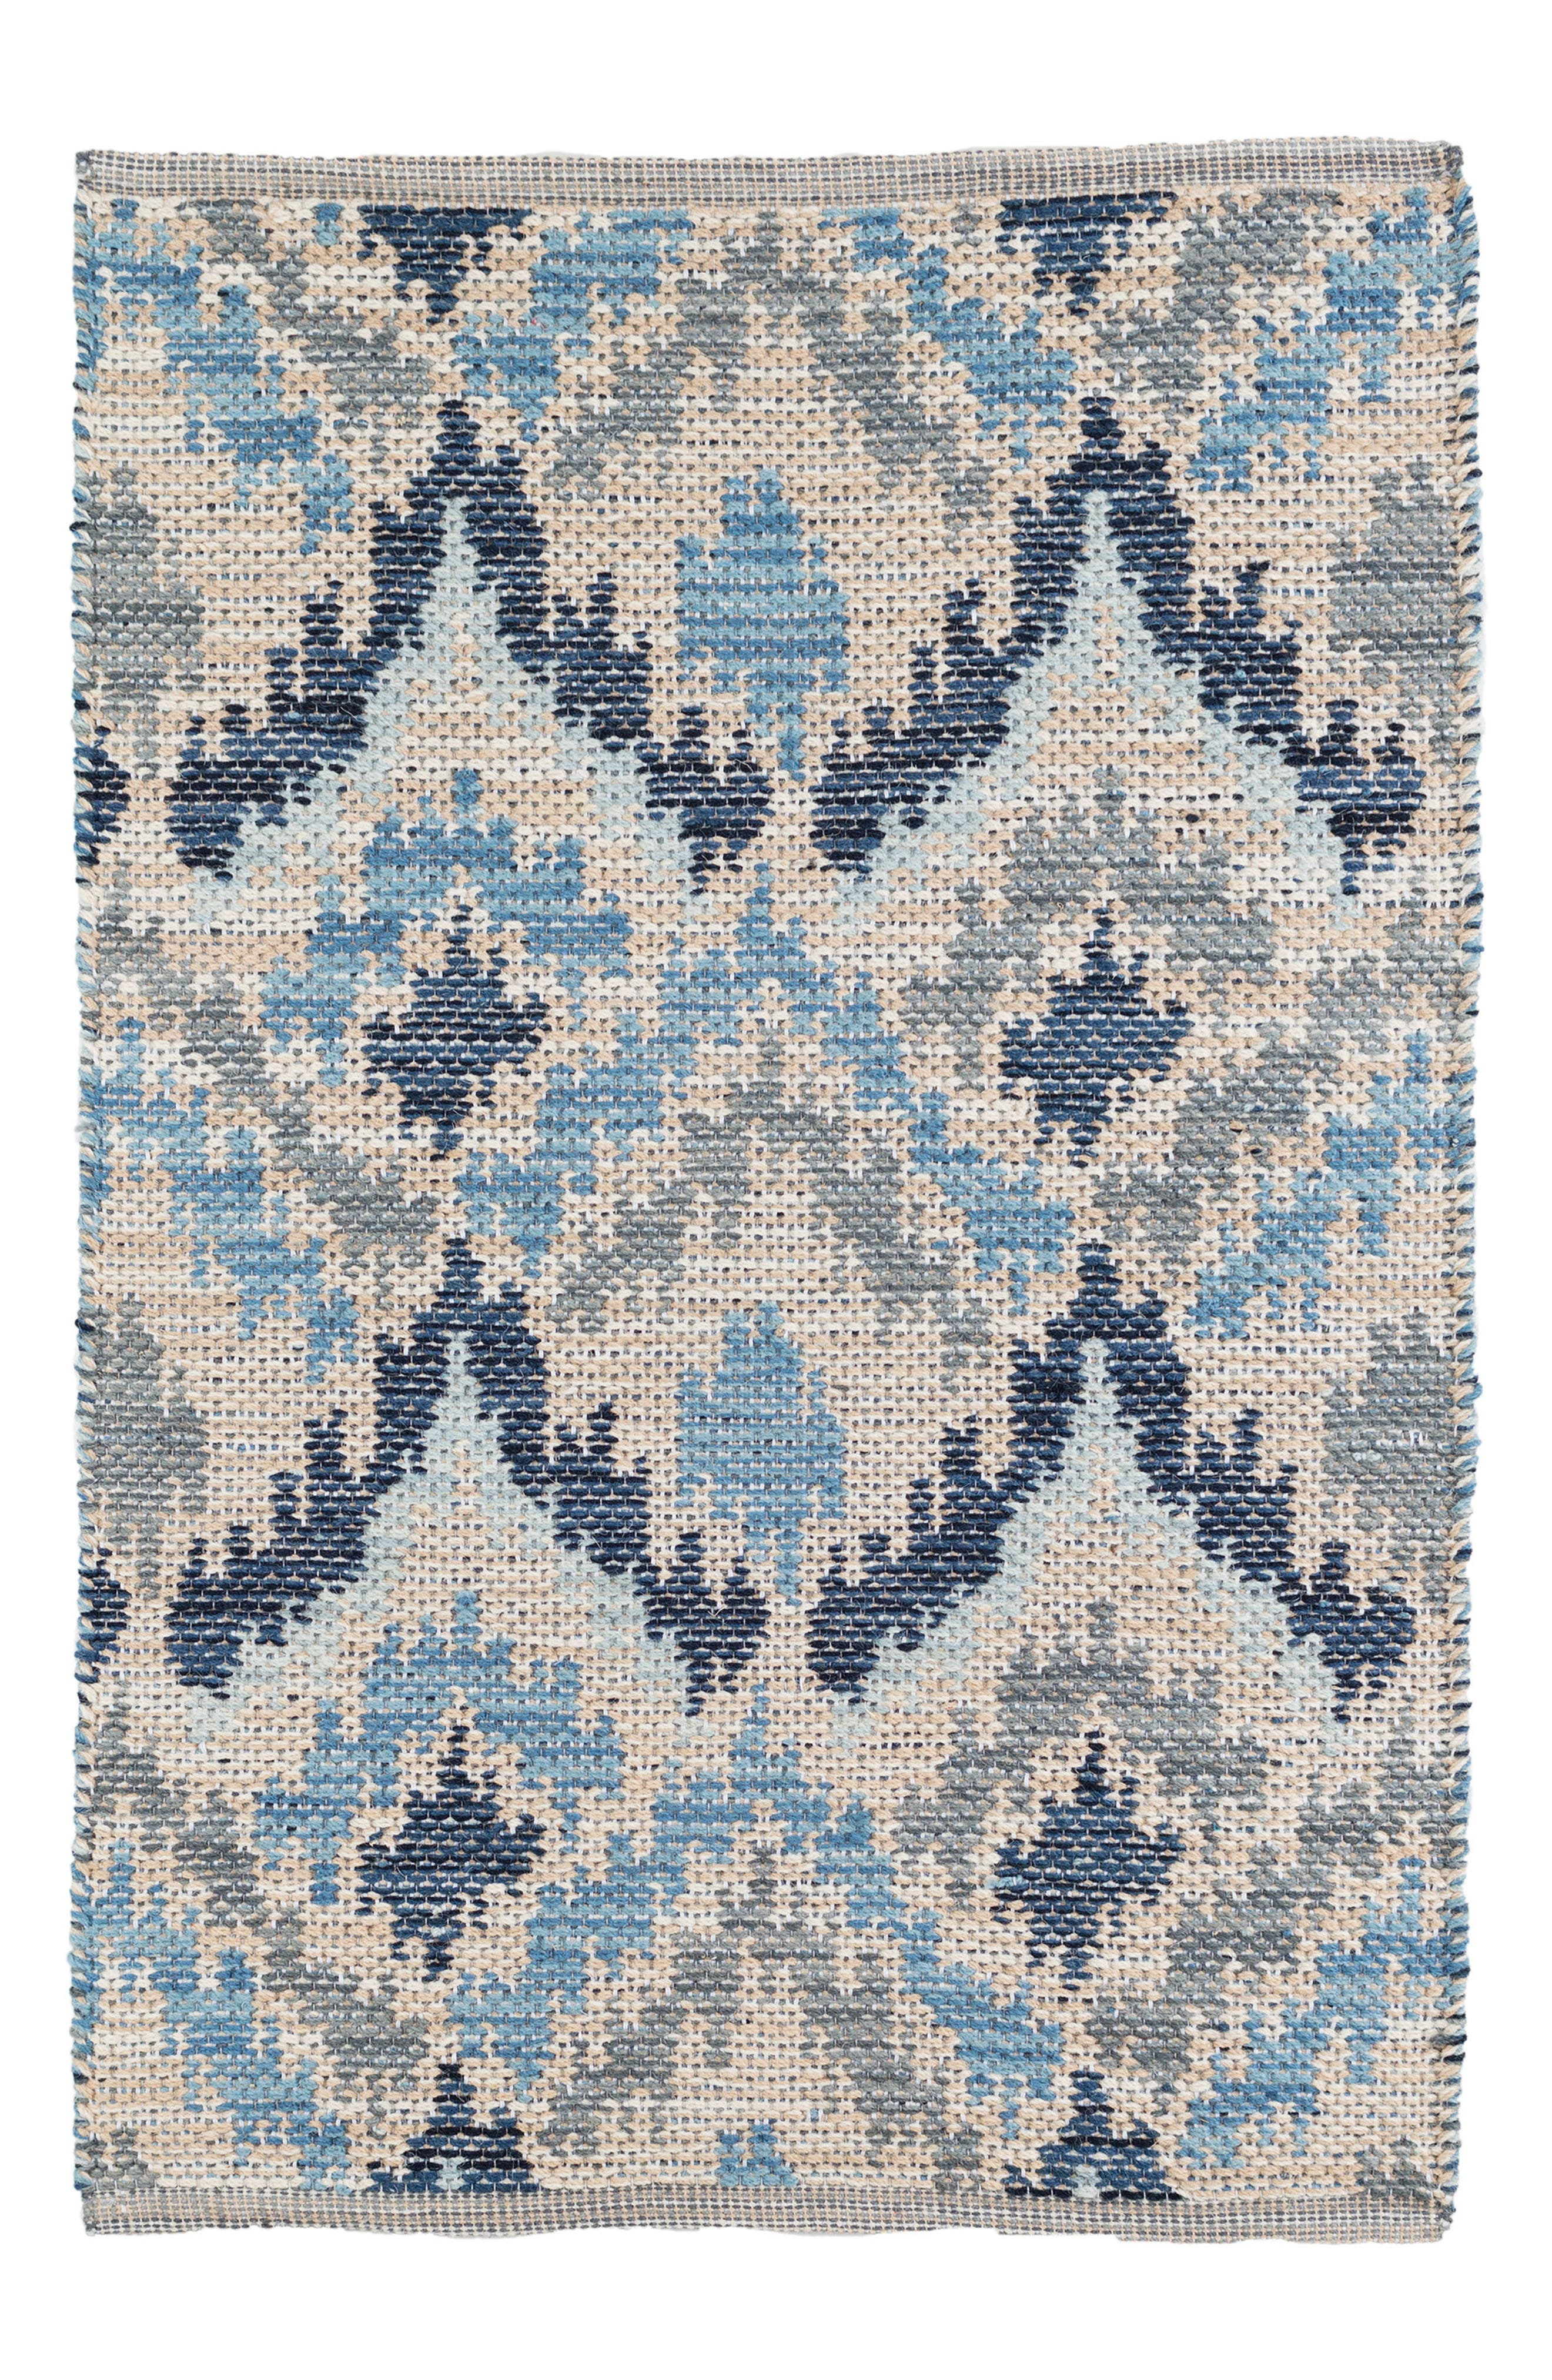 Medina Woven Rug,                         Main,                         color, BLUE